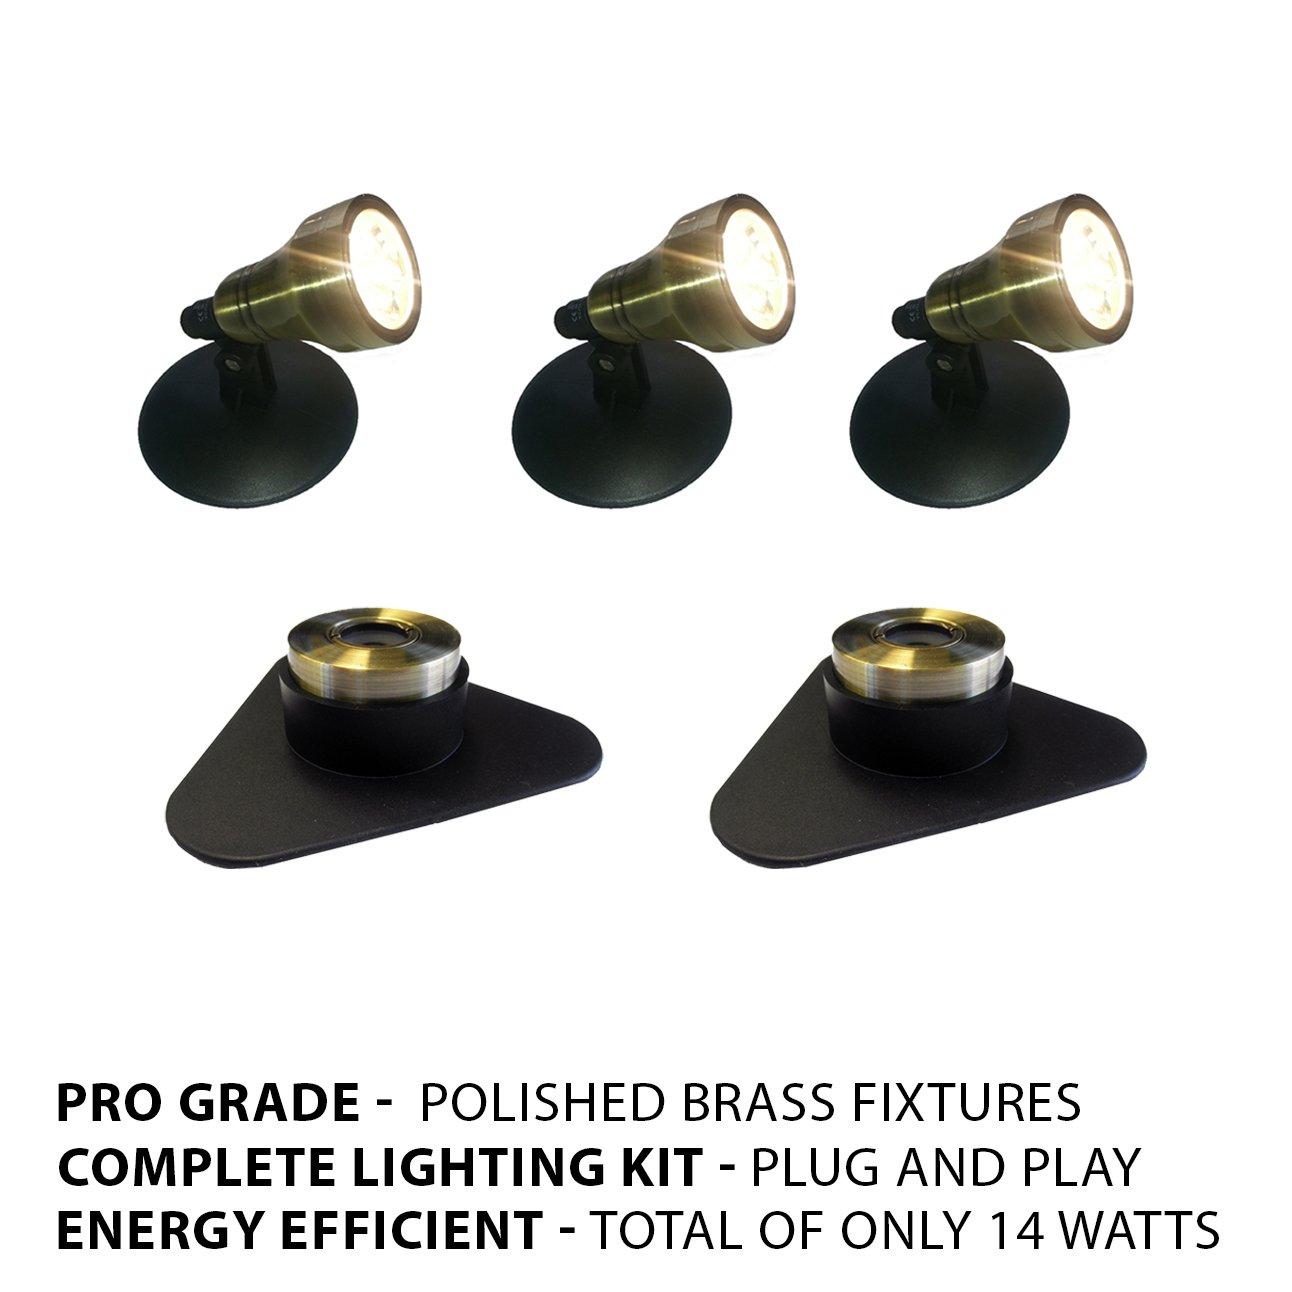 Patriot Brass LED Waterproof Pond and Landscape Lighting 14 Watt Light Kit P-C4